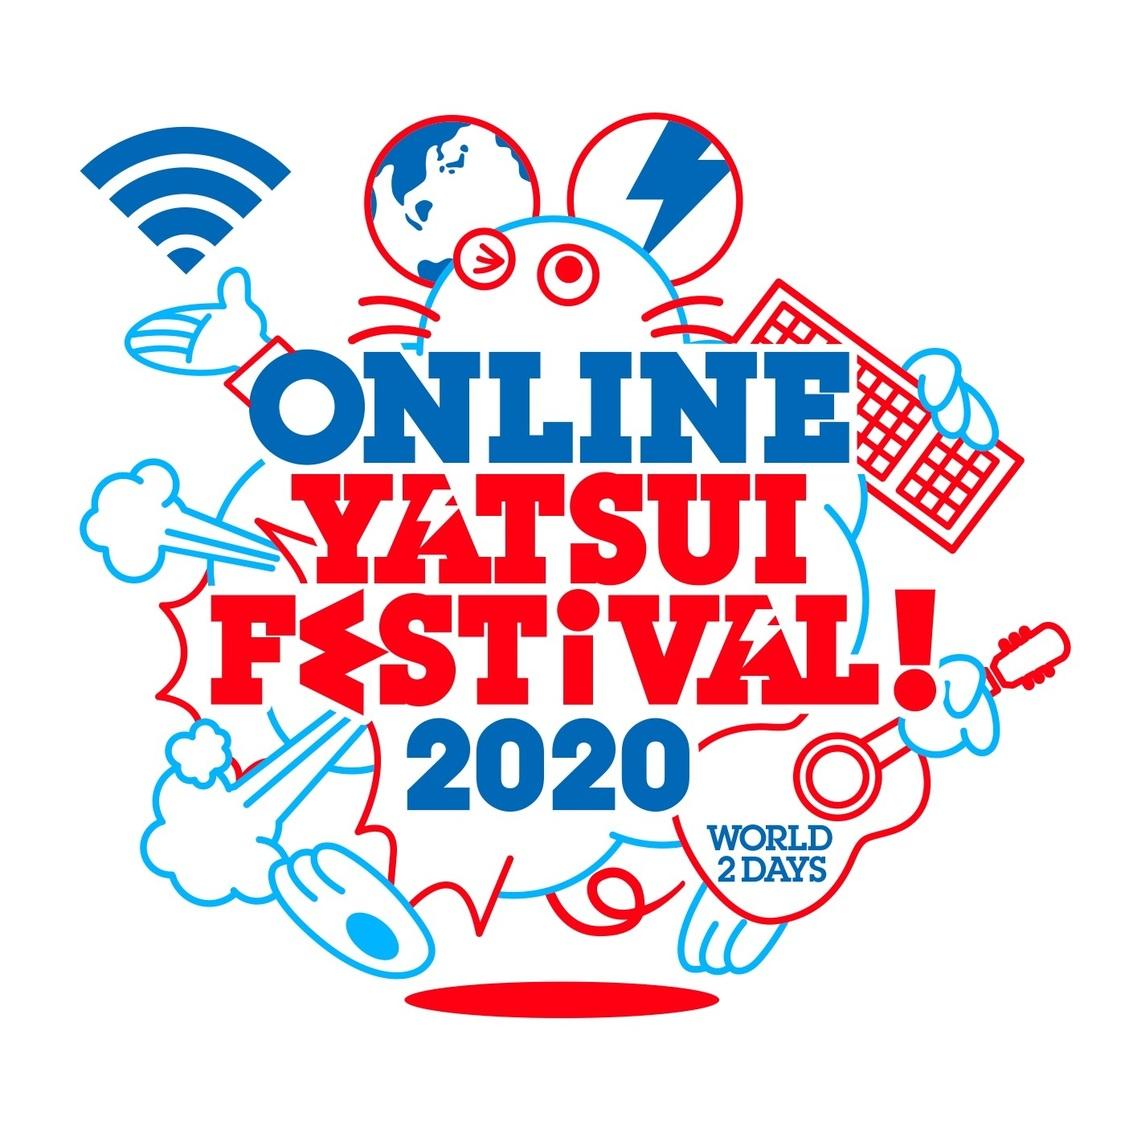 <ONLINE YATSUI FESTIVAL! 2020>、第1弾アーティストにNegicco、木下百花、meme tokyo.、眉村ちあきら決定!